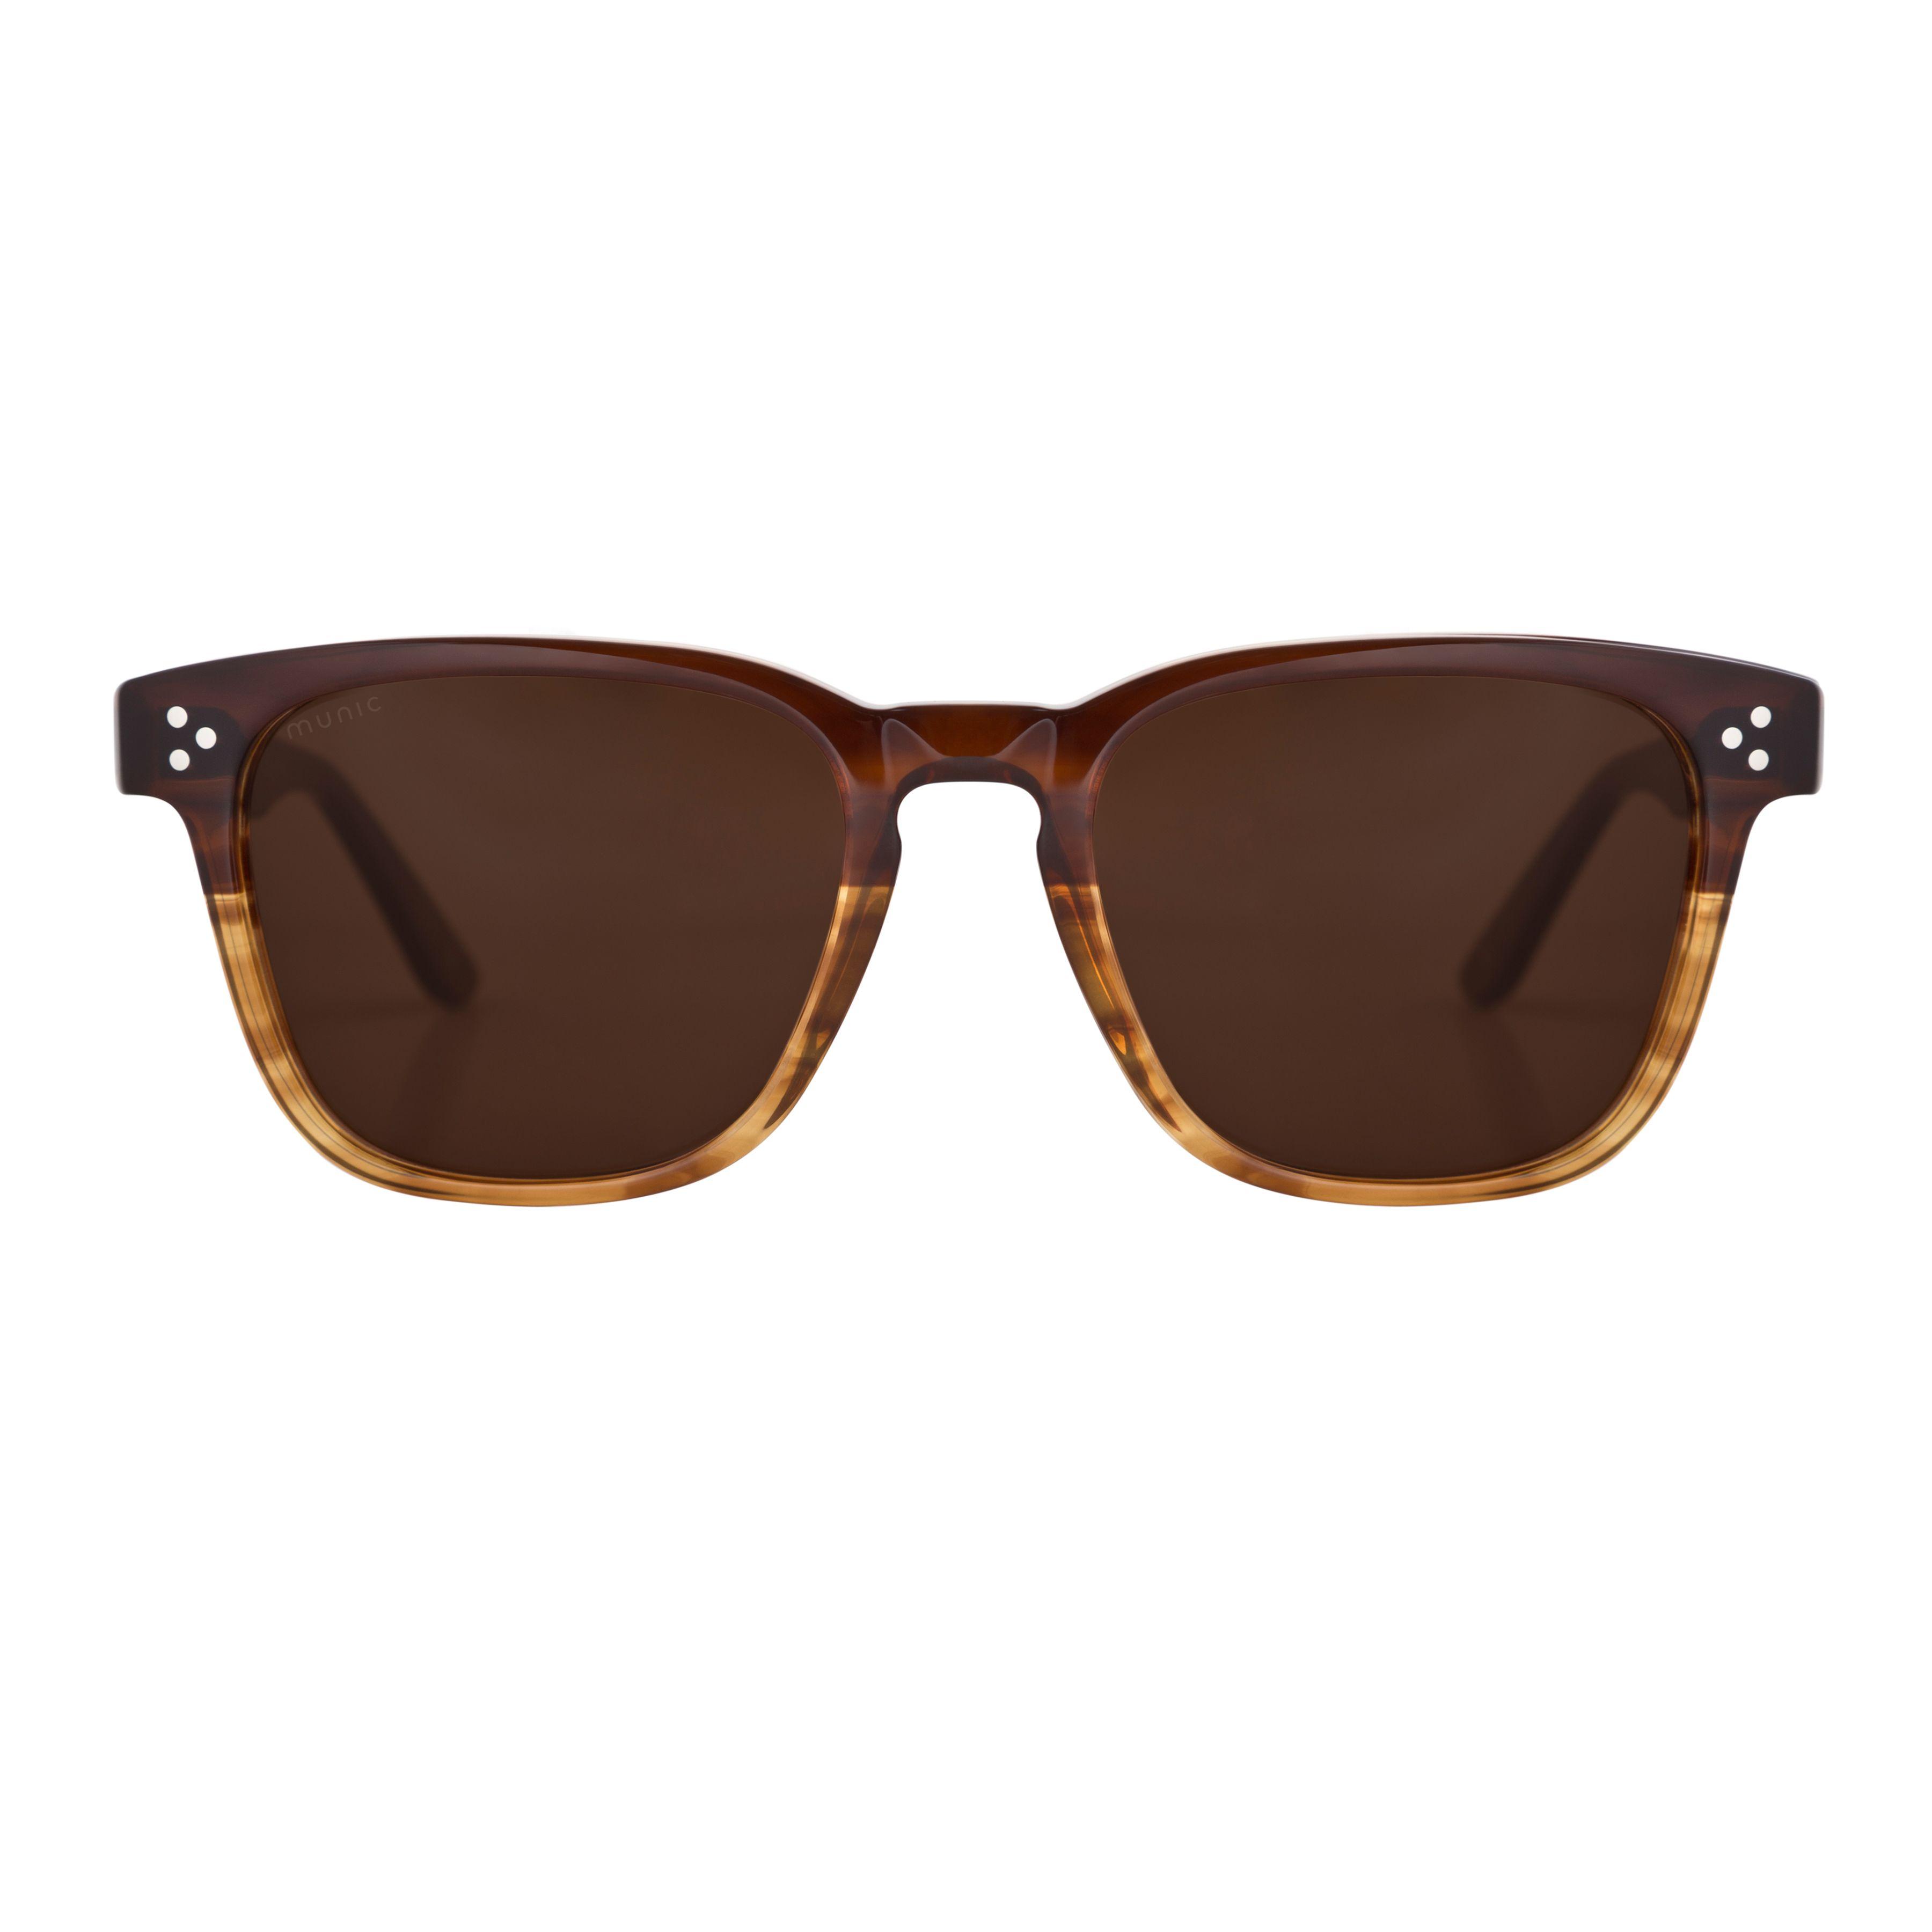 munic eyewear - mod. 9 col. 417 eyewear fashion - sunglasses ...